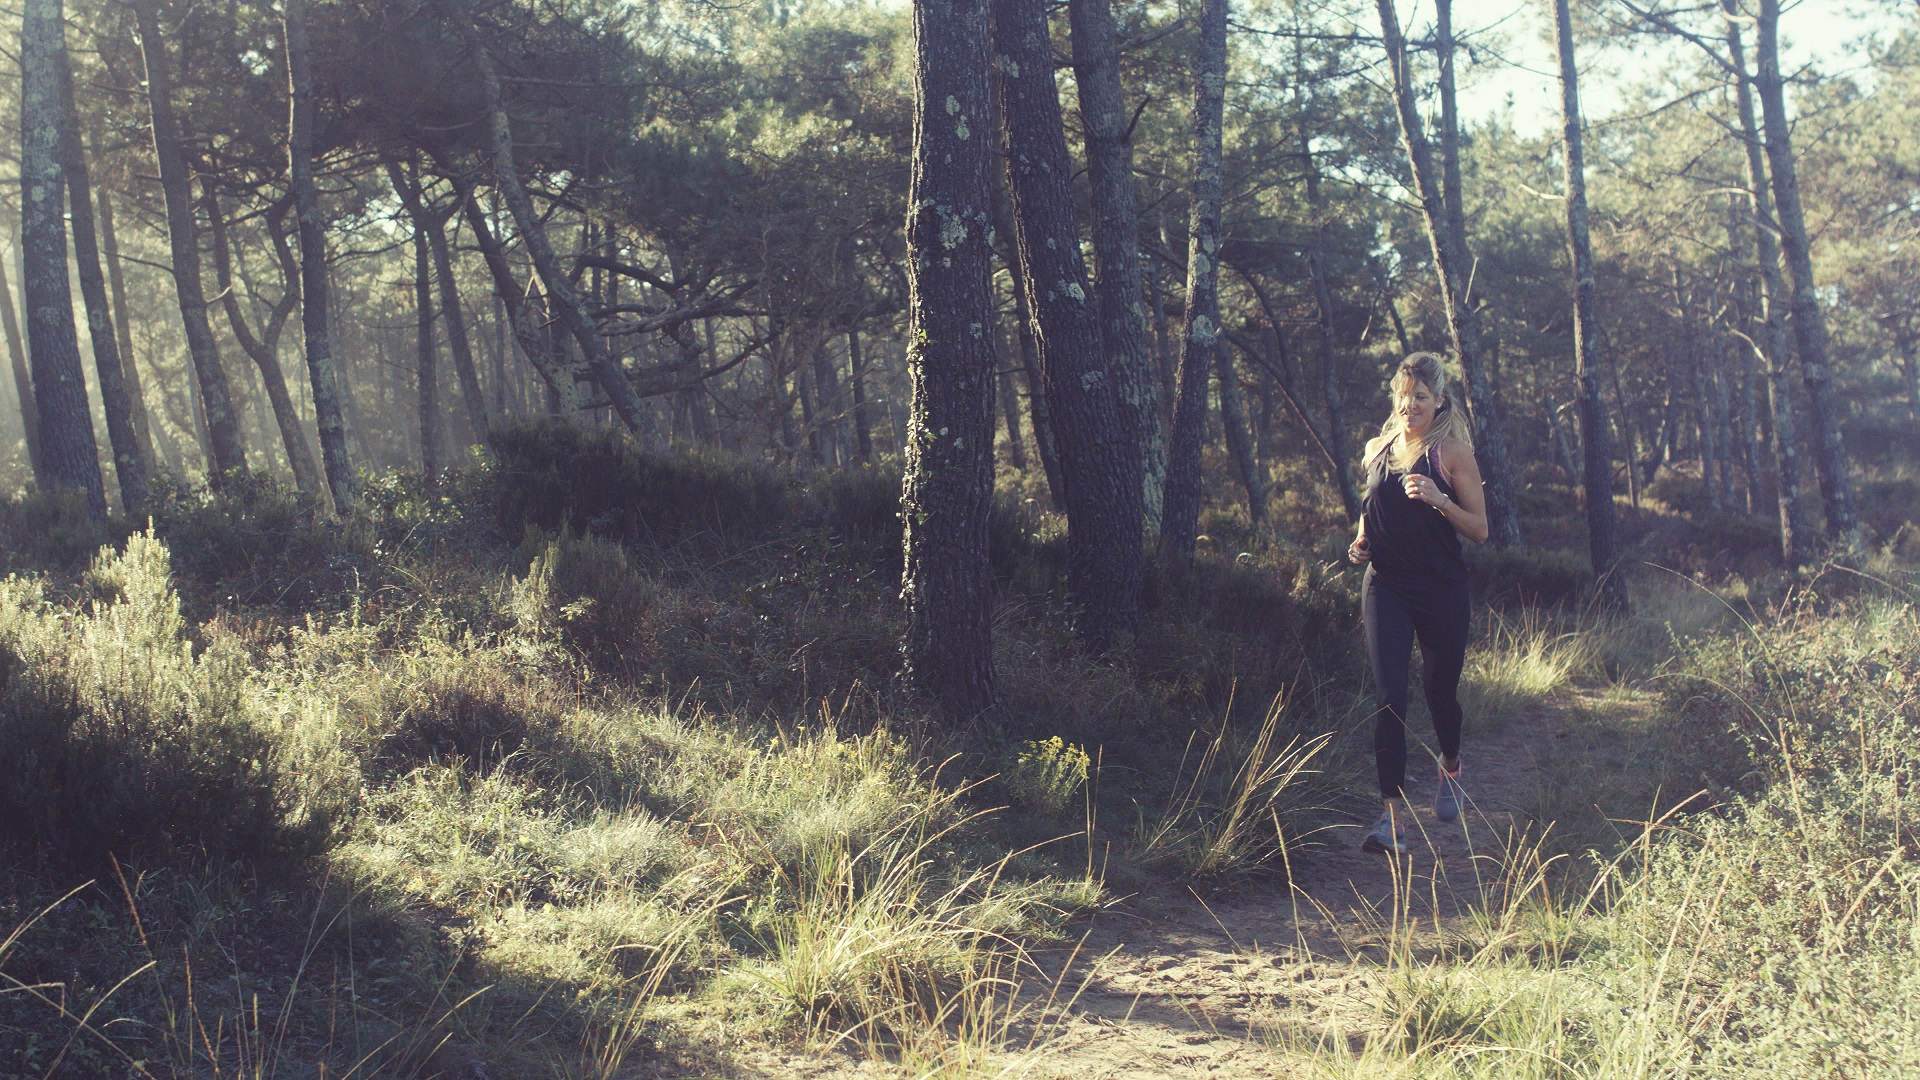 Running foret dame